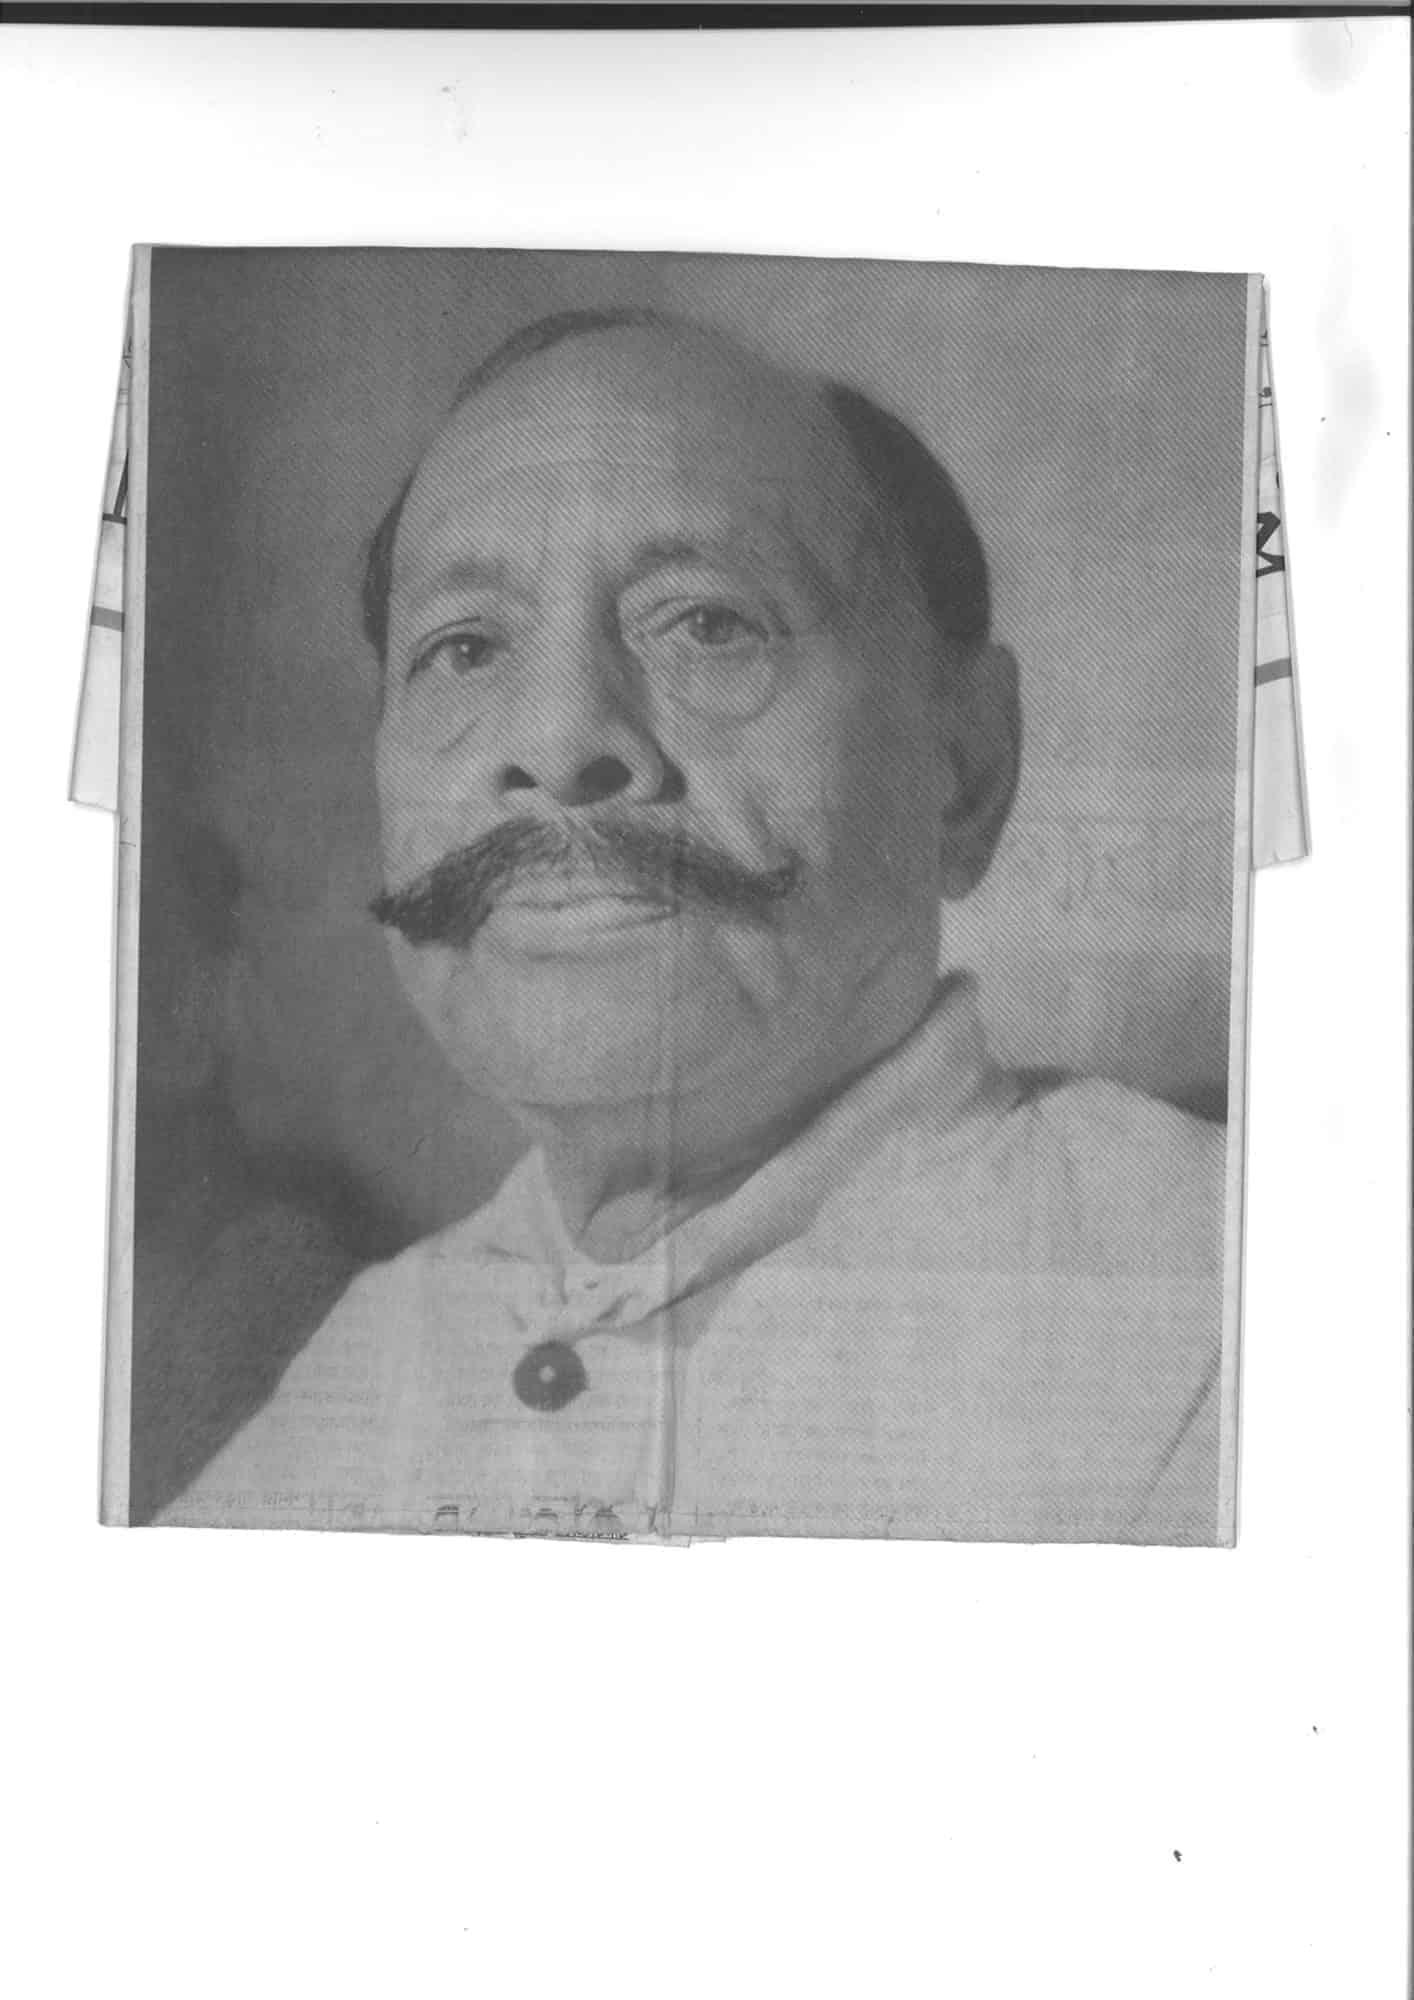 उस्ताद फैयाज खान Ustad Faiyaz Khan